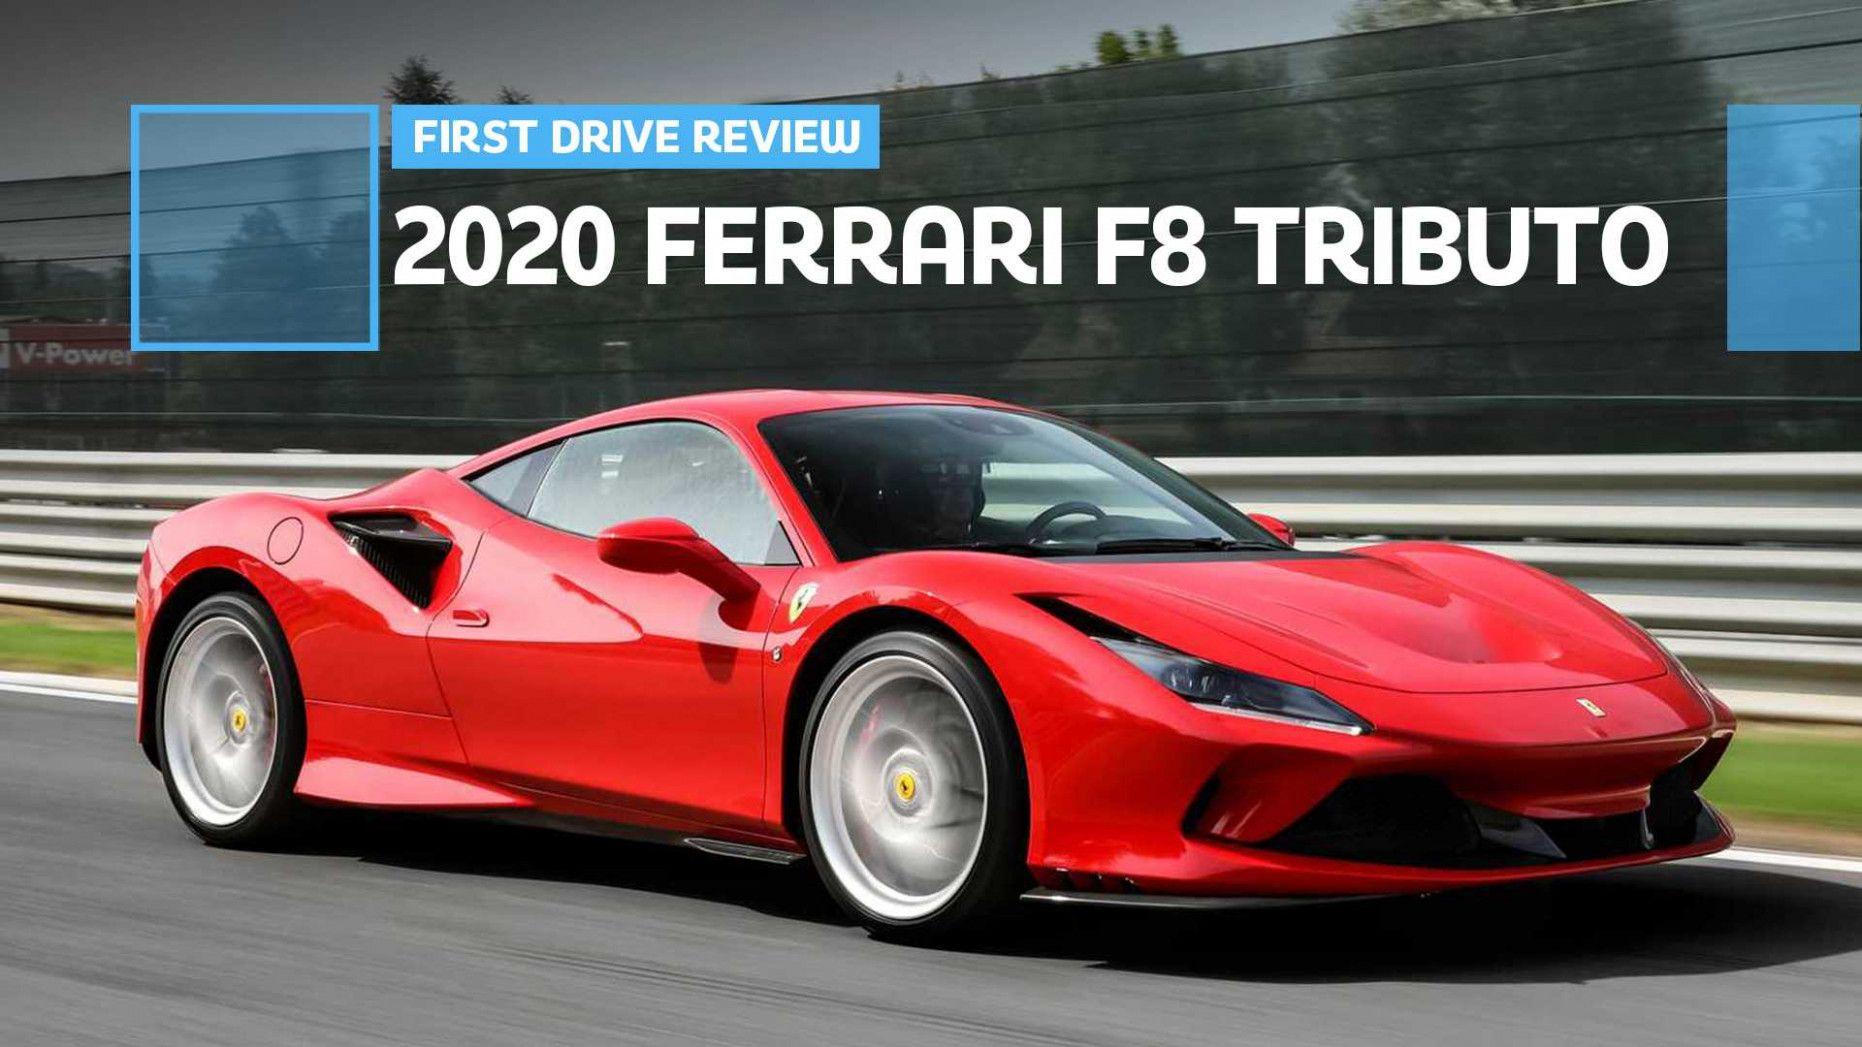 Ferrari Team 2020 Images Ferrari Ferrari Price Ferrari Car